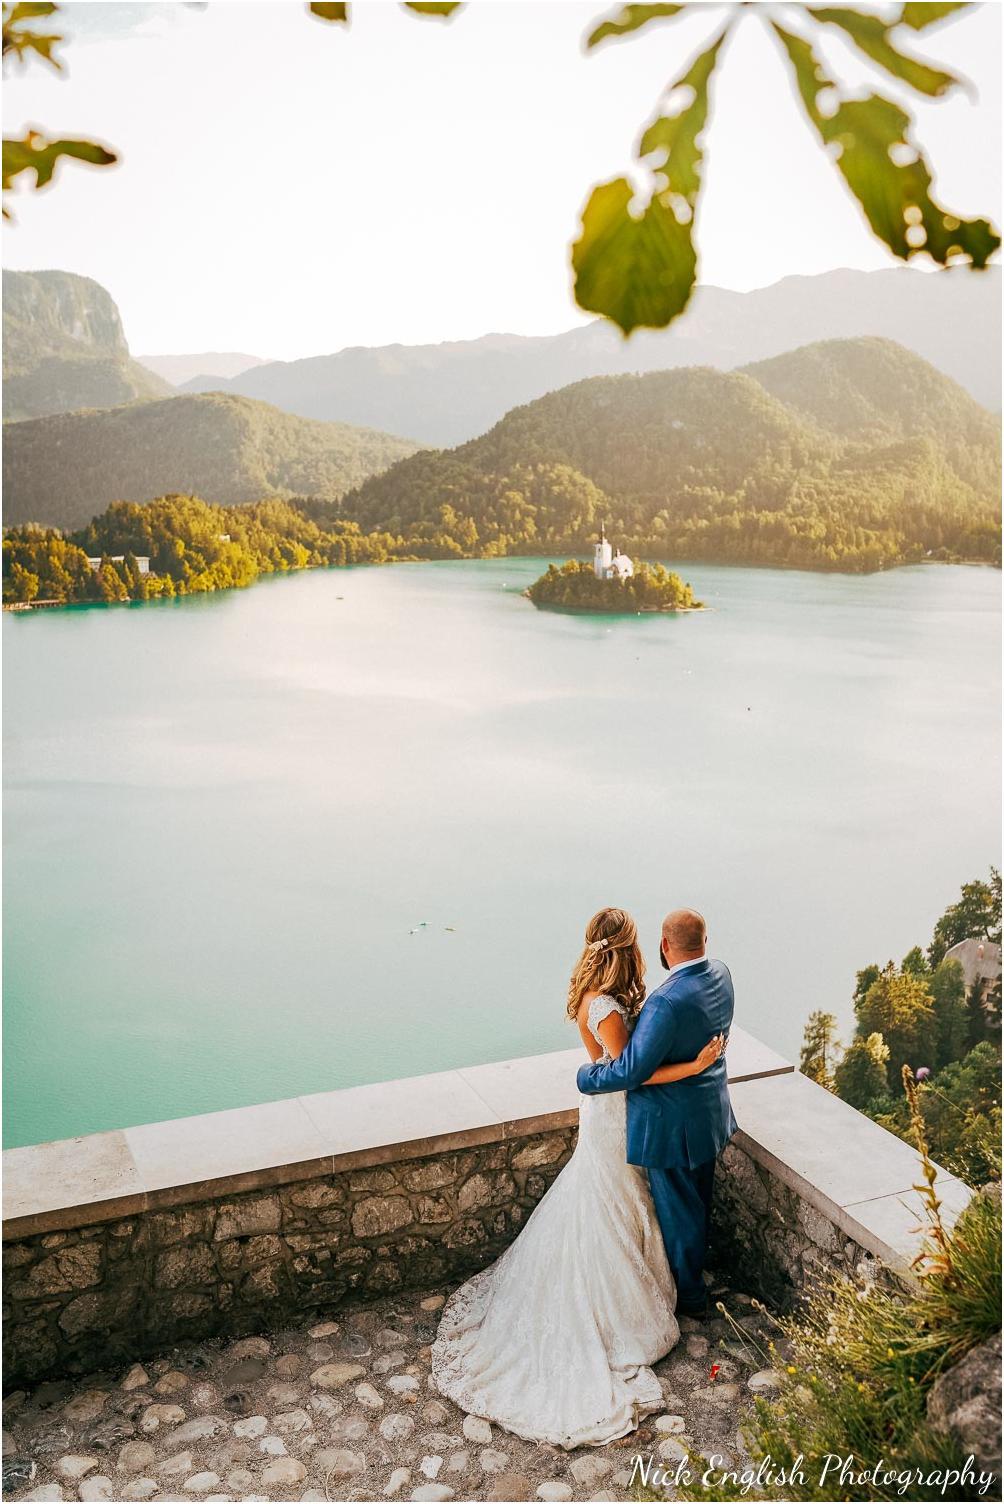 Destination_Wedding_Photographer_Slovenia_Nick_English_Photography-70-27.jpg